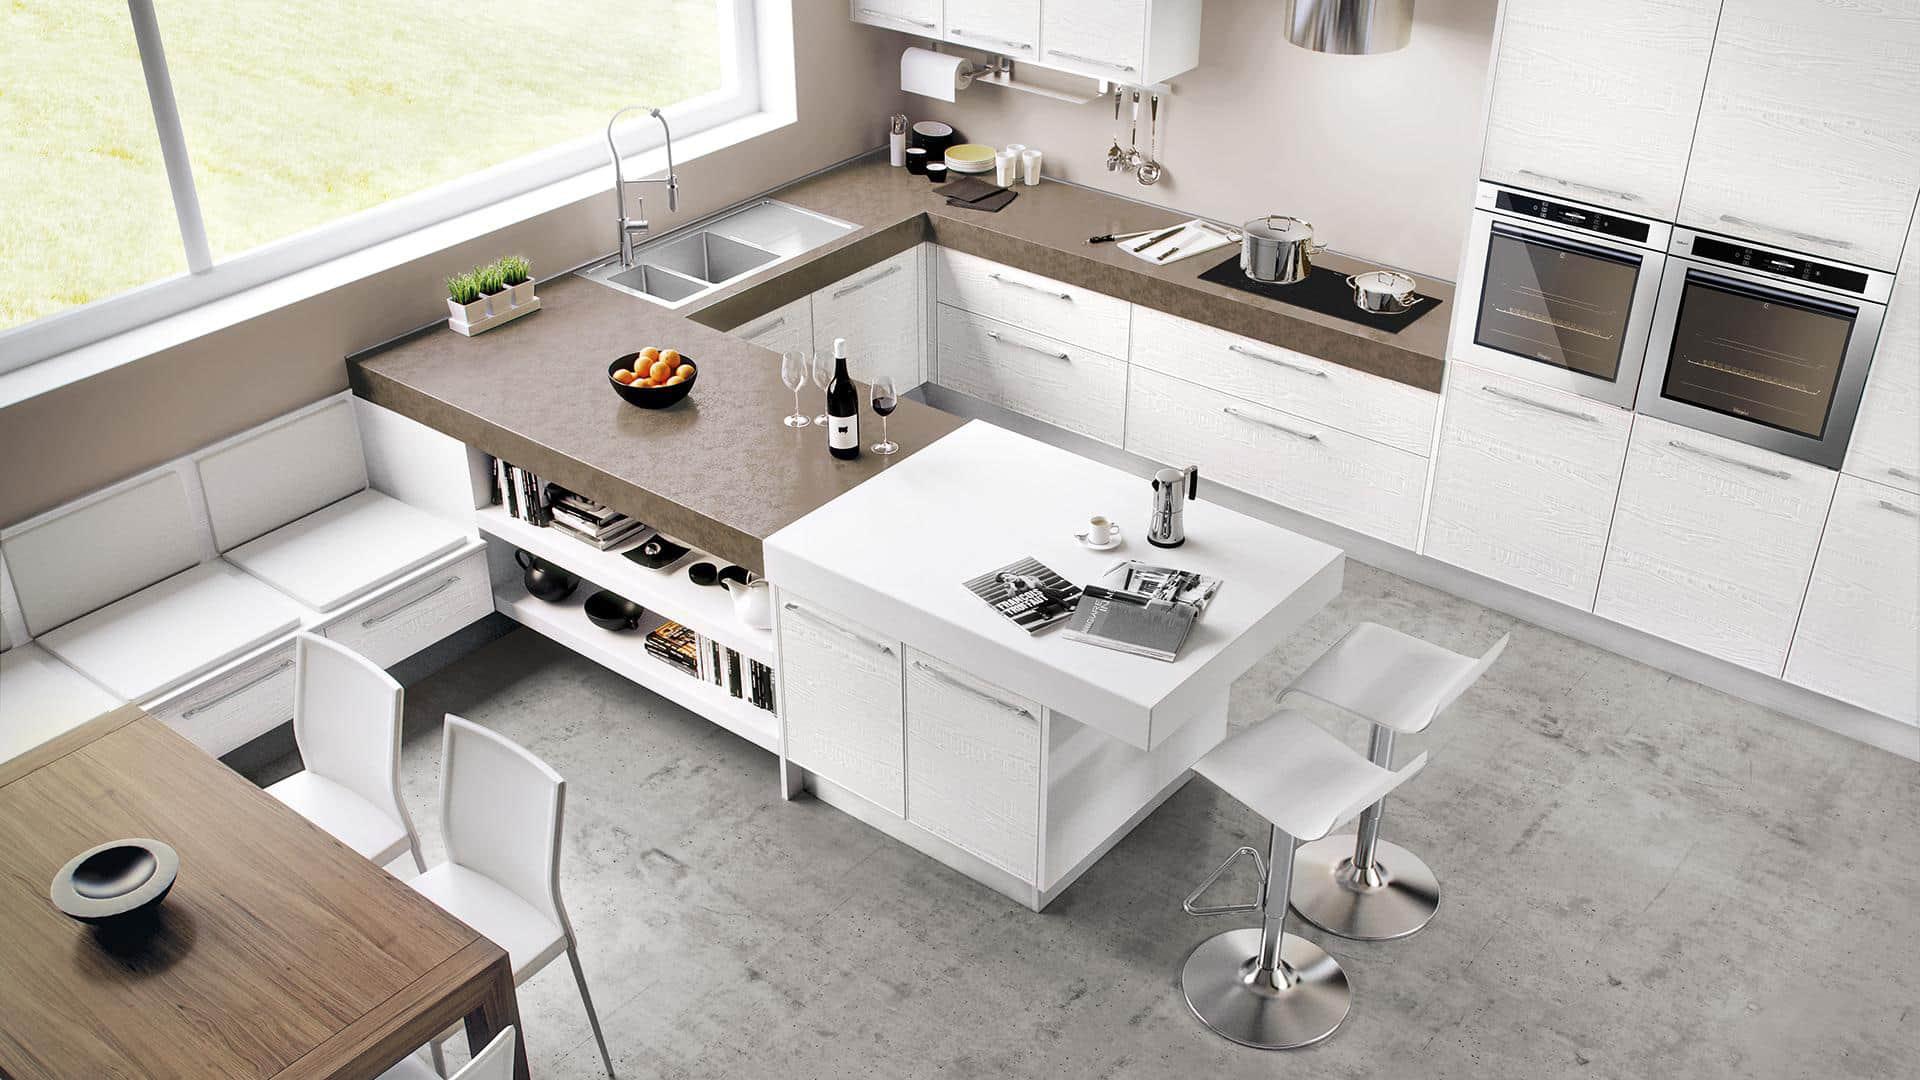 Cucine angolari moderne a padova - Cucine moderne con penisola ...